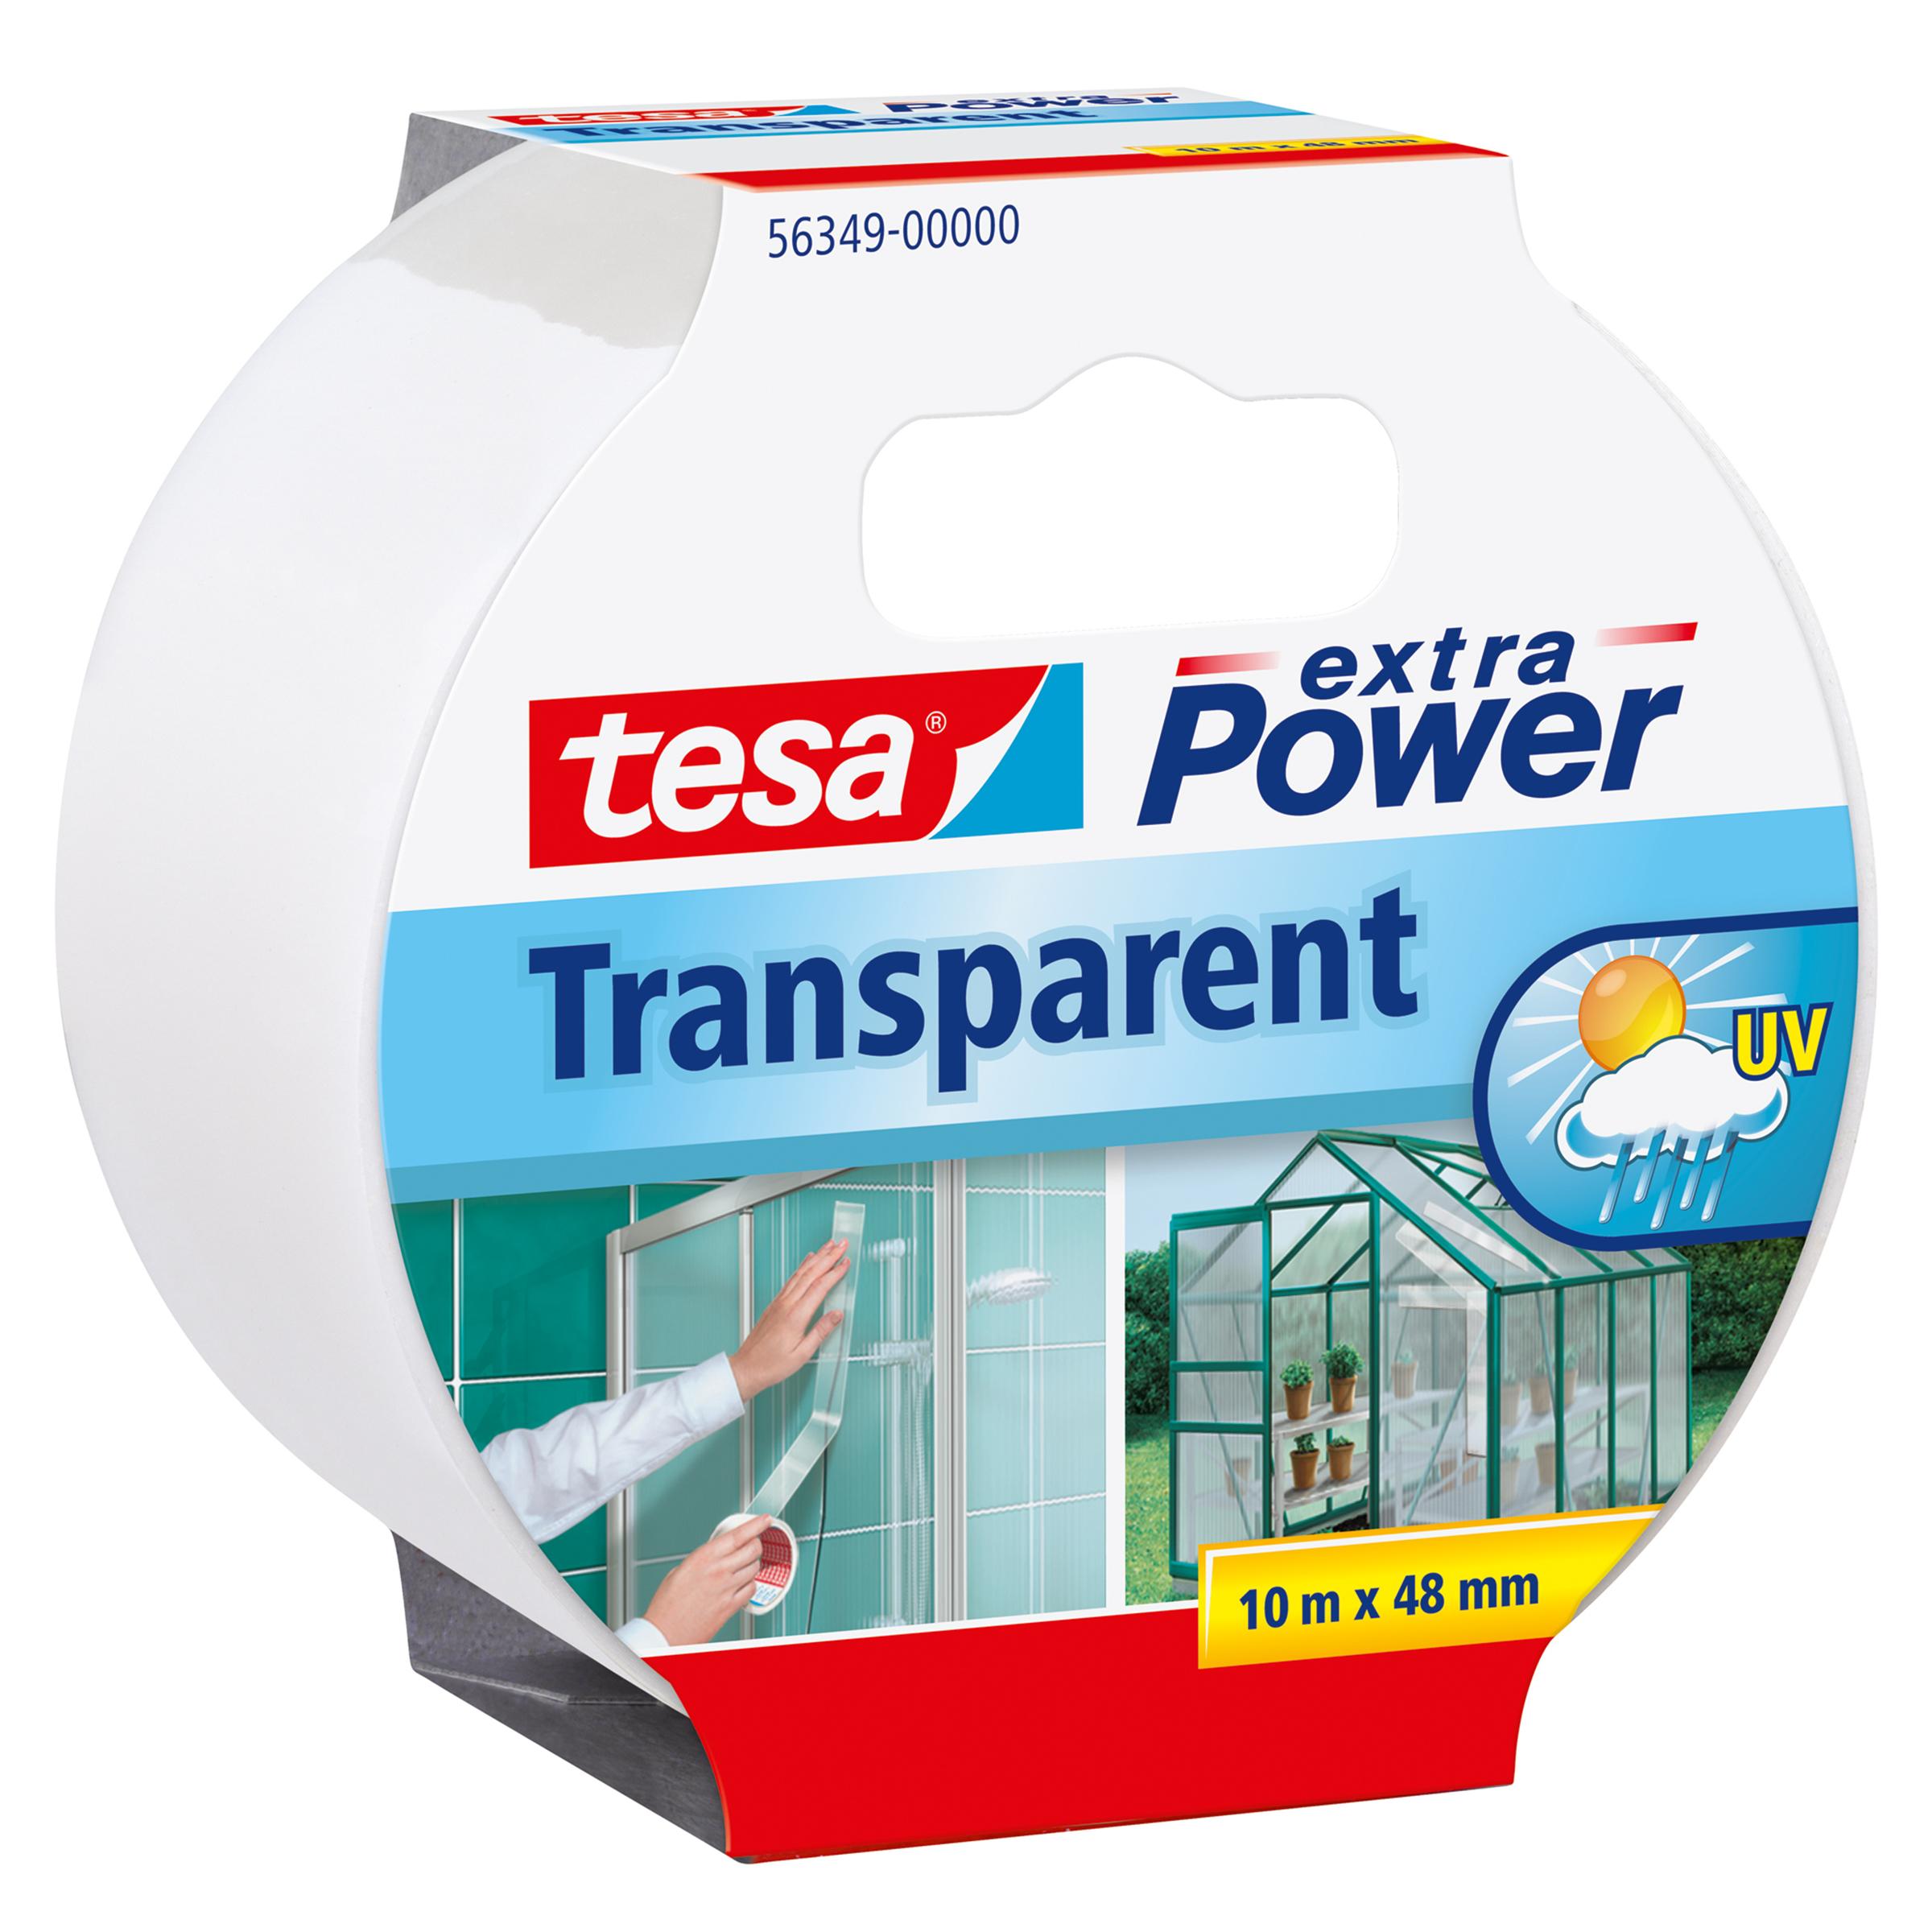 Tesa extra Power Transparant - 10 m - Transparent - Glas - Kunststoff - Stark - 48 mm - 1 Stück(e)